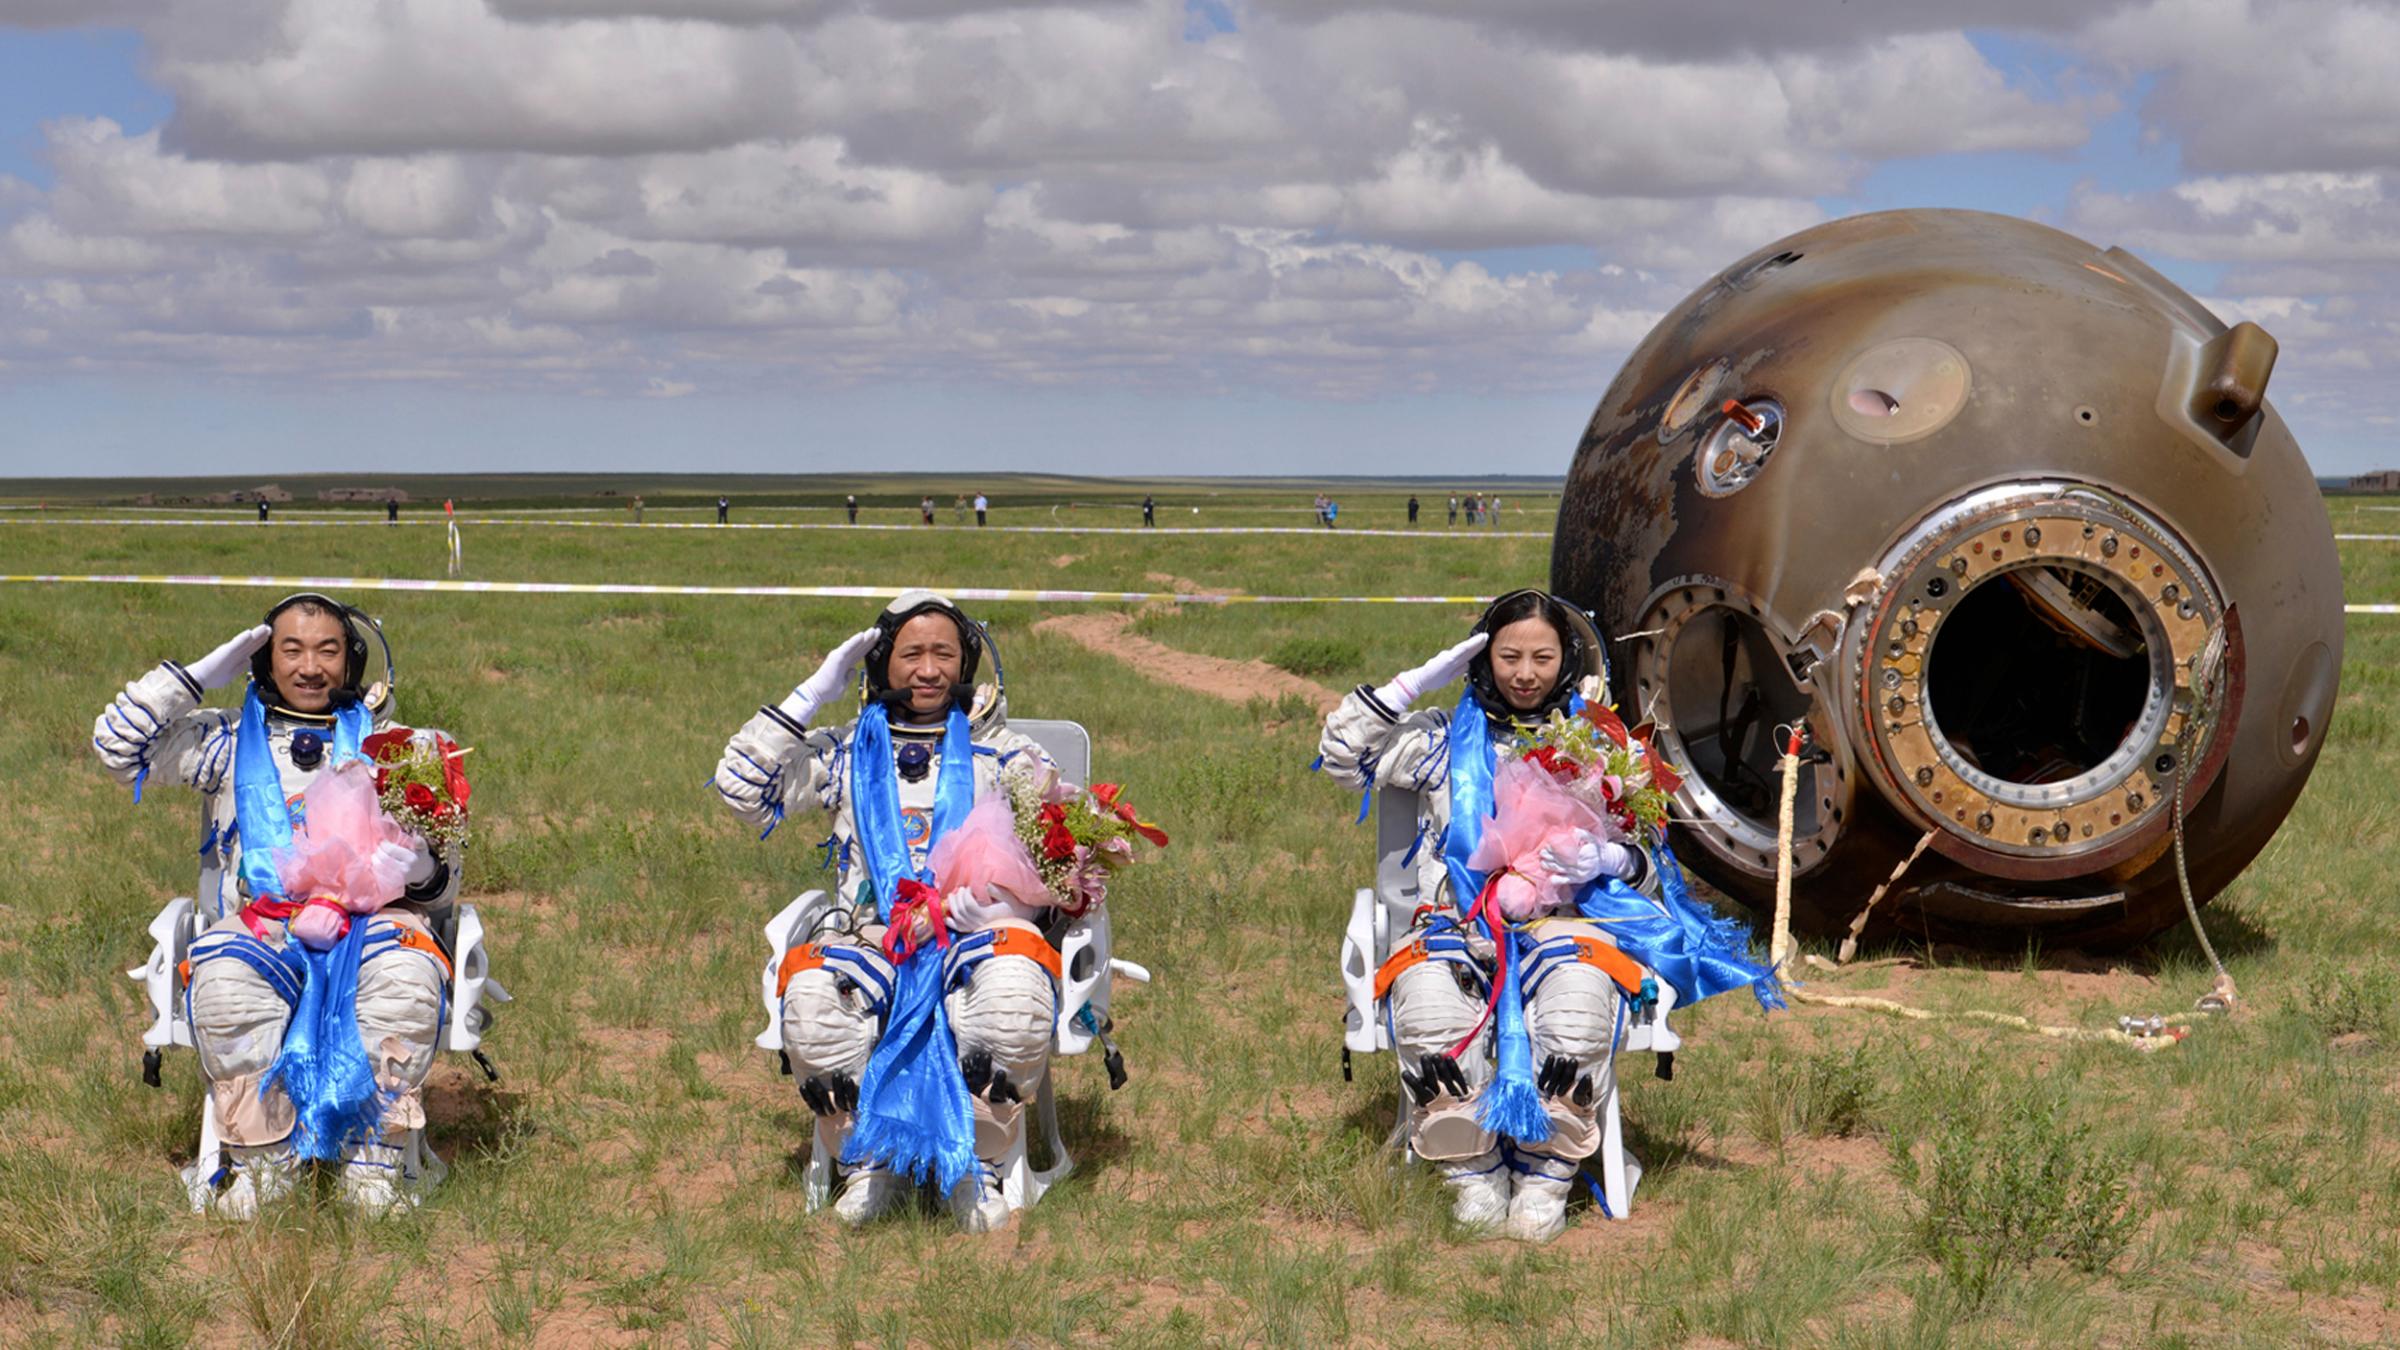 China's Shenzhou-10 spacecraft